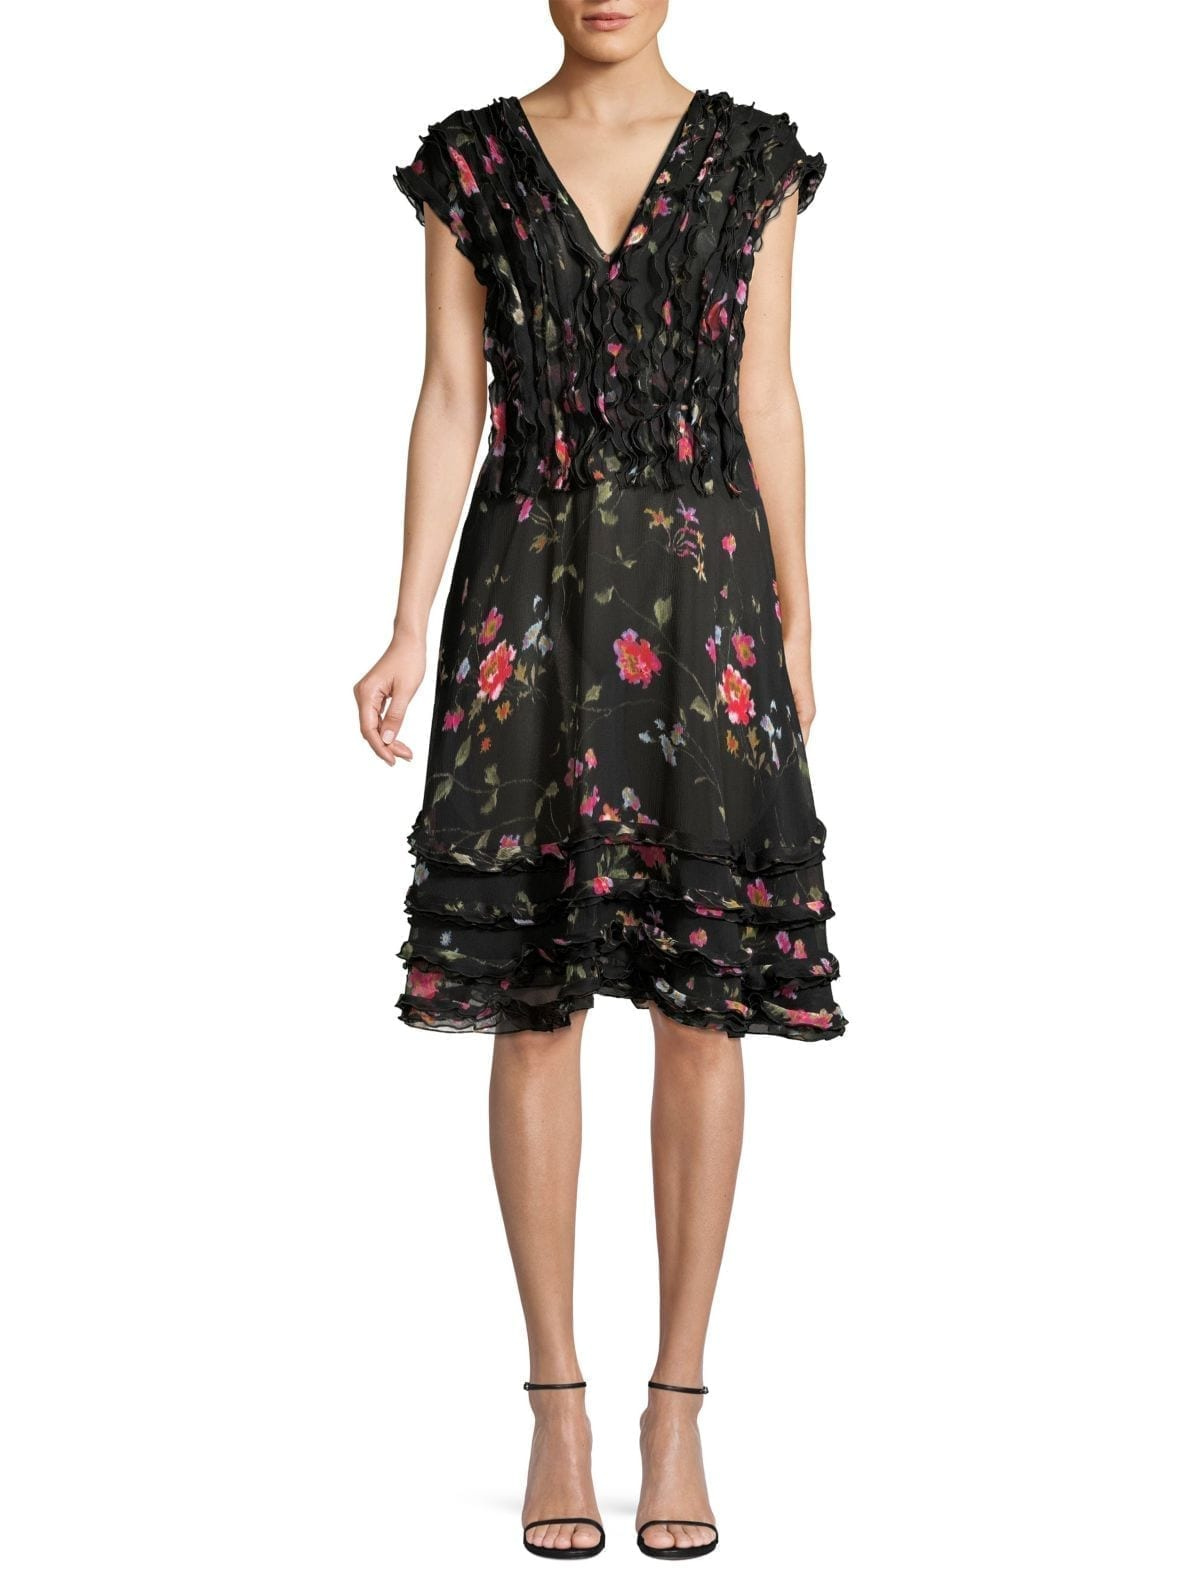 JASON WU COLLECTION Floral Vine Silk Chiffon Day Dress